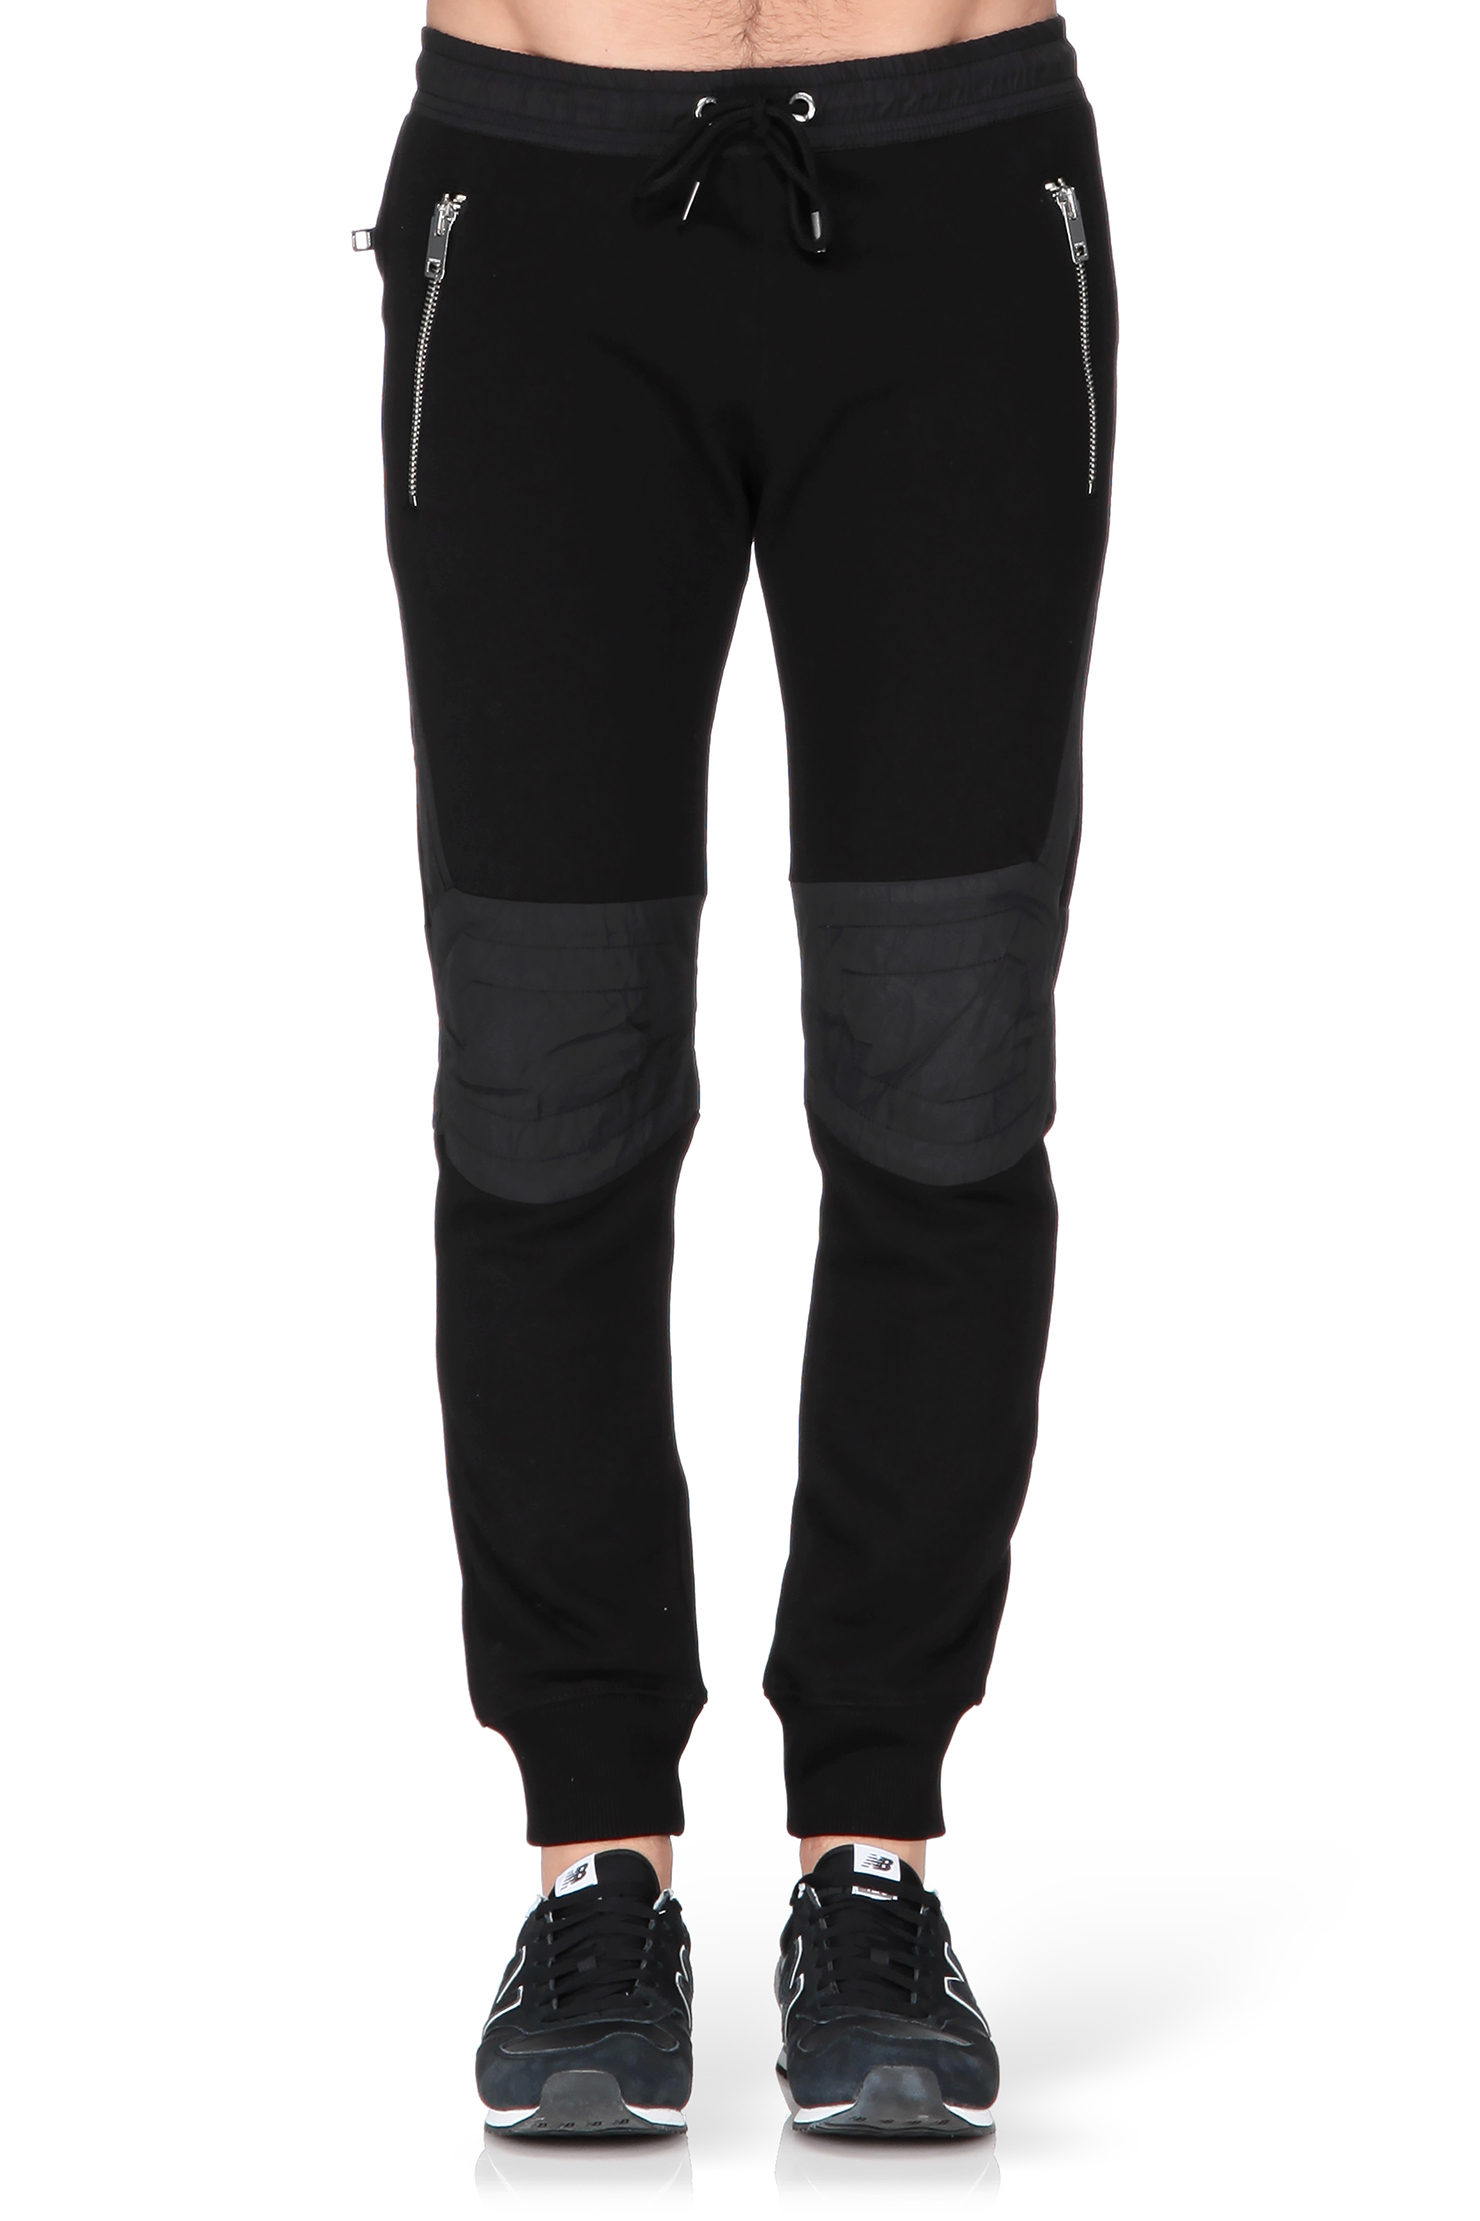 Amazing  Sweatpants On Pinterest  Nike Sweatpants Nike Pants And Teen Pants